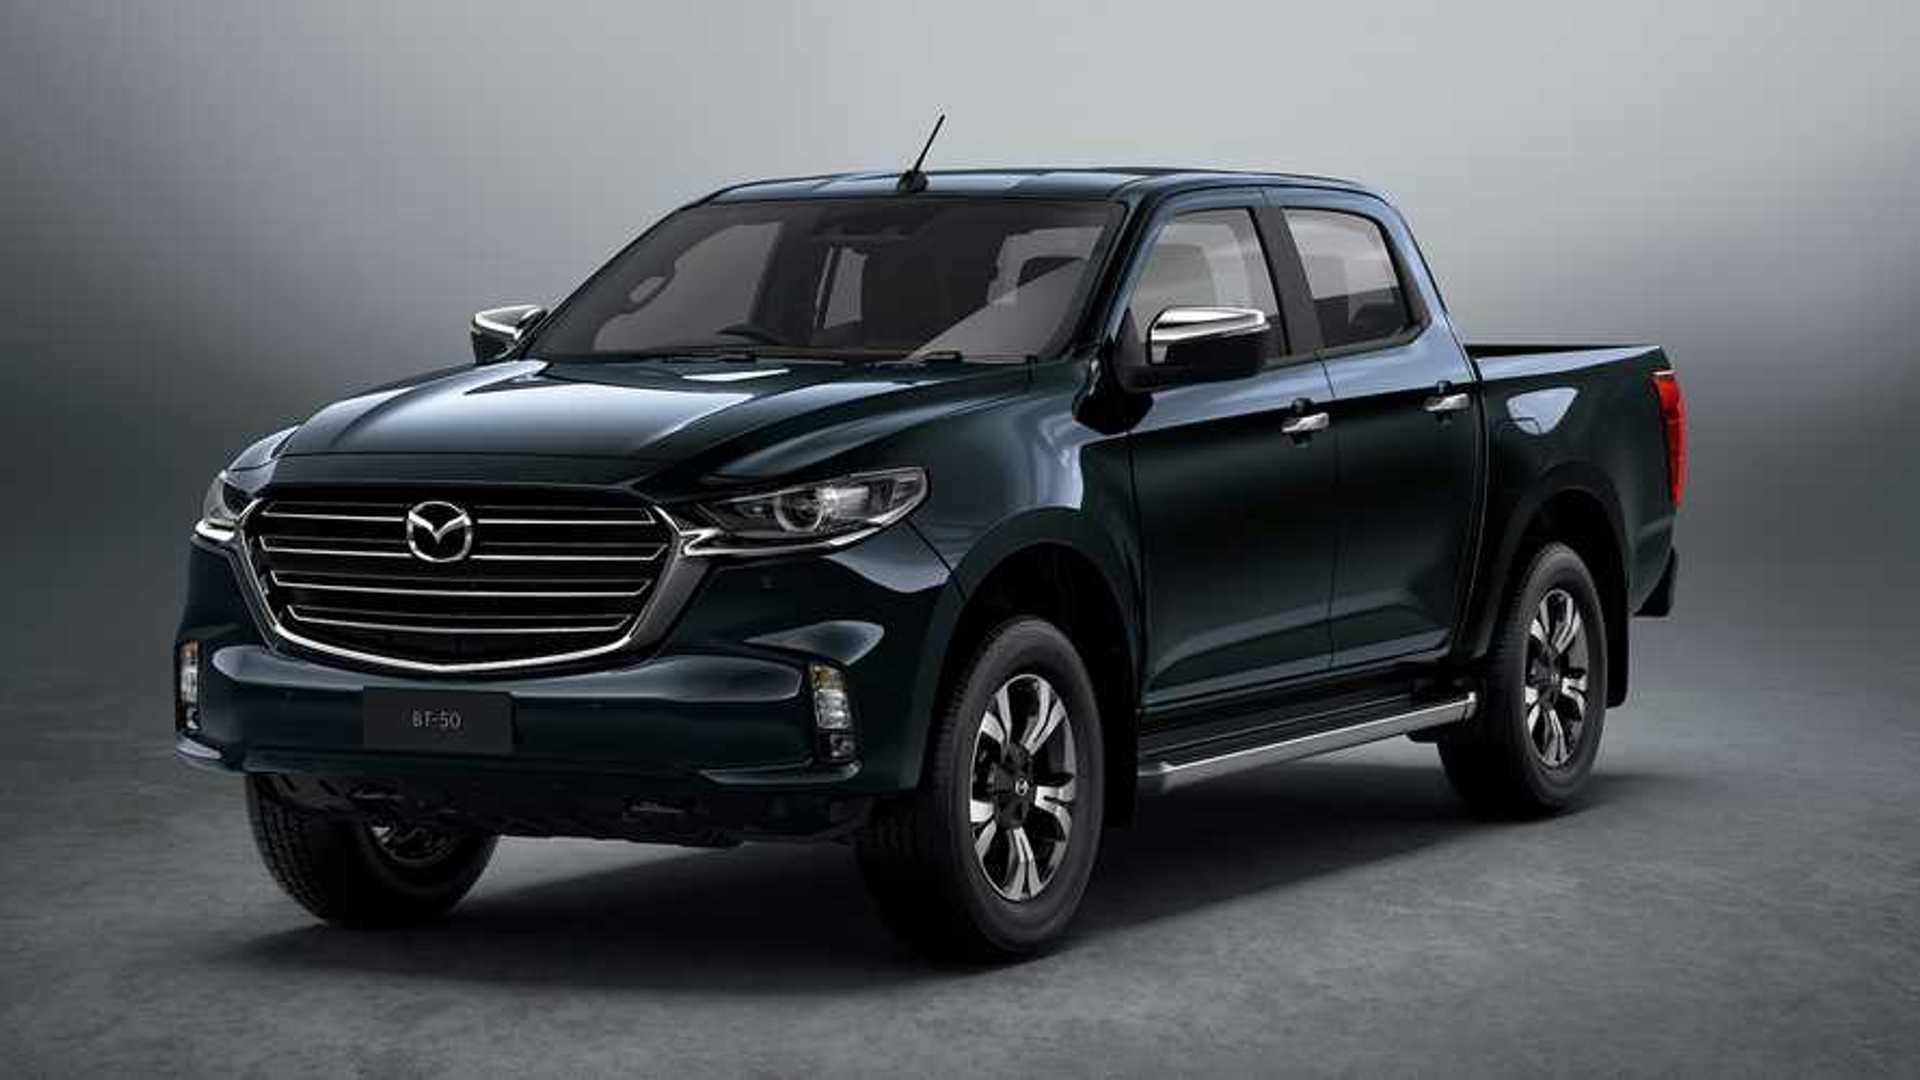 2021 Mazda BT-50 Debuts Sultry Kodo Design Atop Isuzu ...